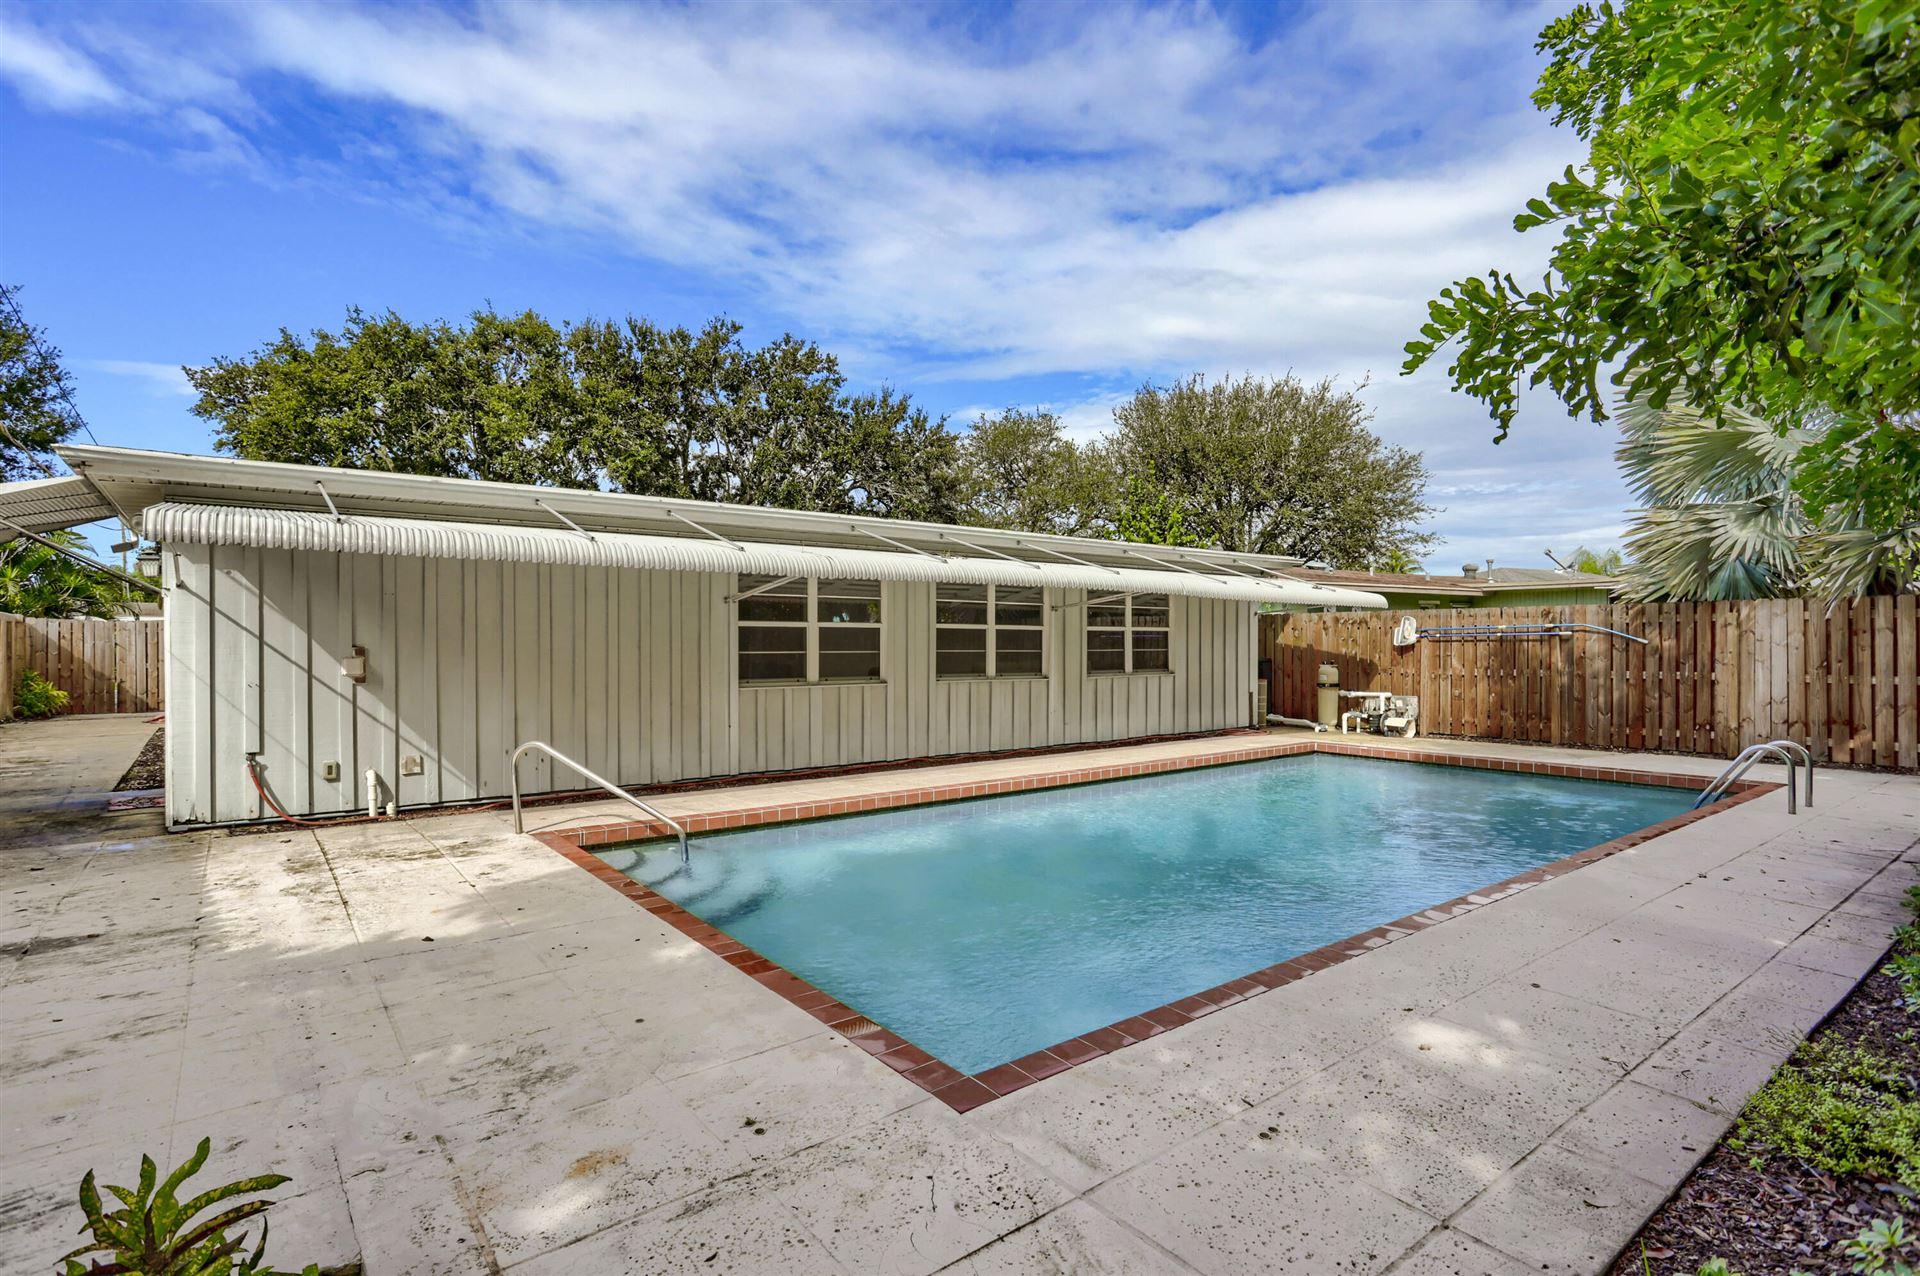 Photo for 526 Ivy Avenue, Palm Beach Gardens, FL 33410 (MLS # RX-10751790)